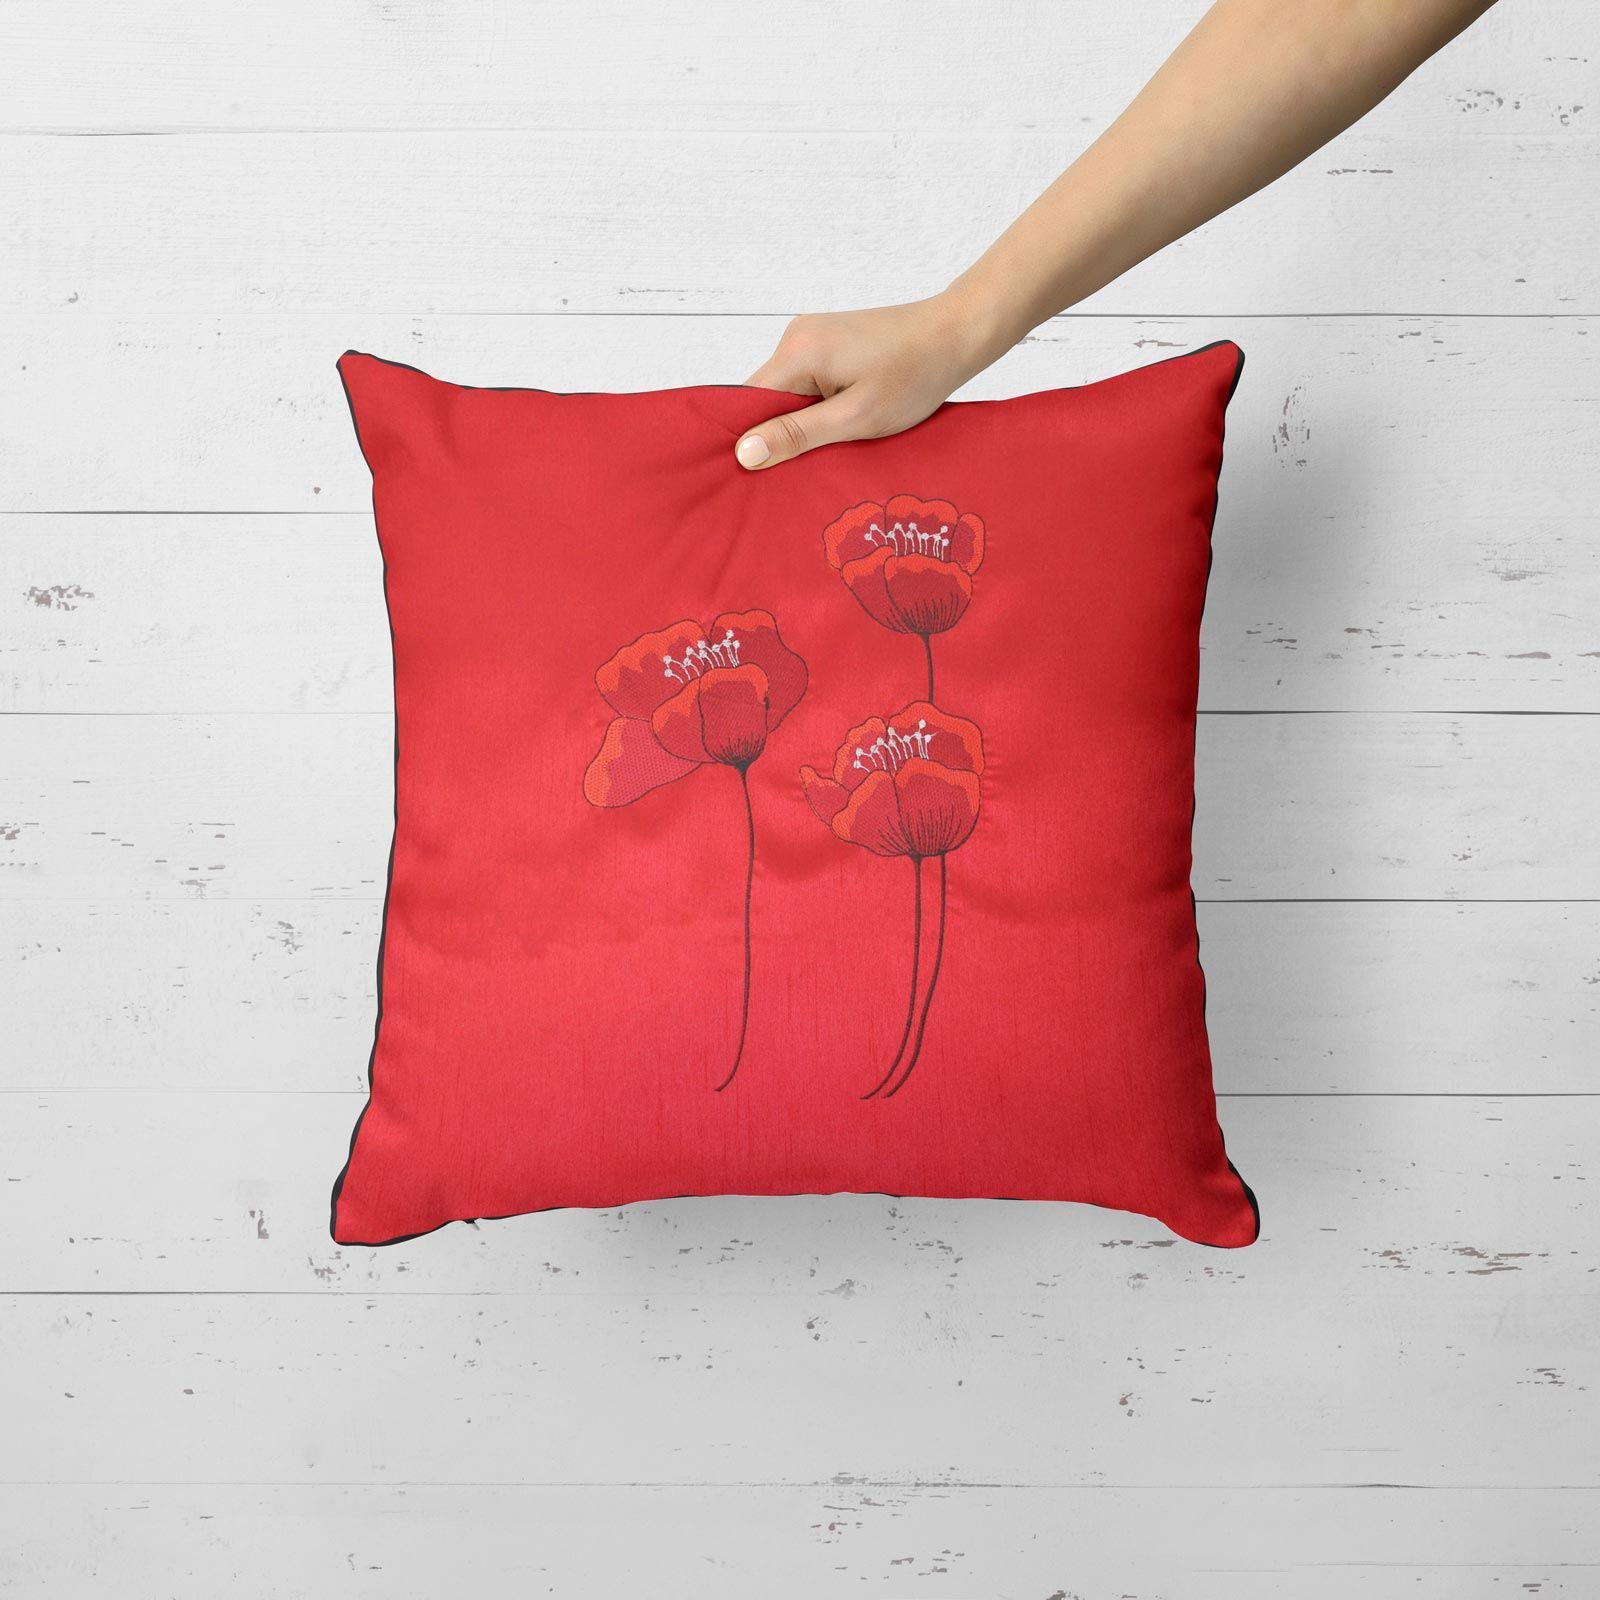 Vino-Tinto-Cushion-Covers-Coleccion-17-034-18-034-43cm-45cm-Cubierta miniatura 35